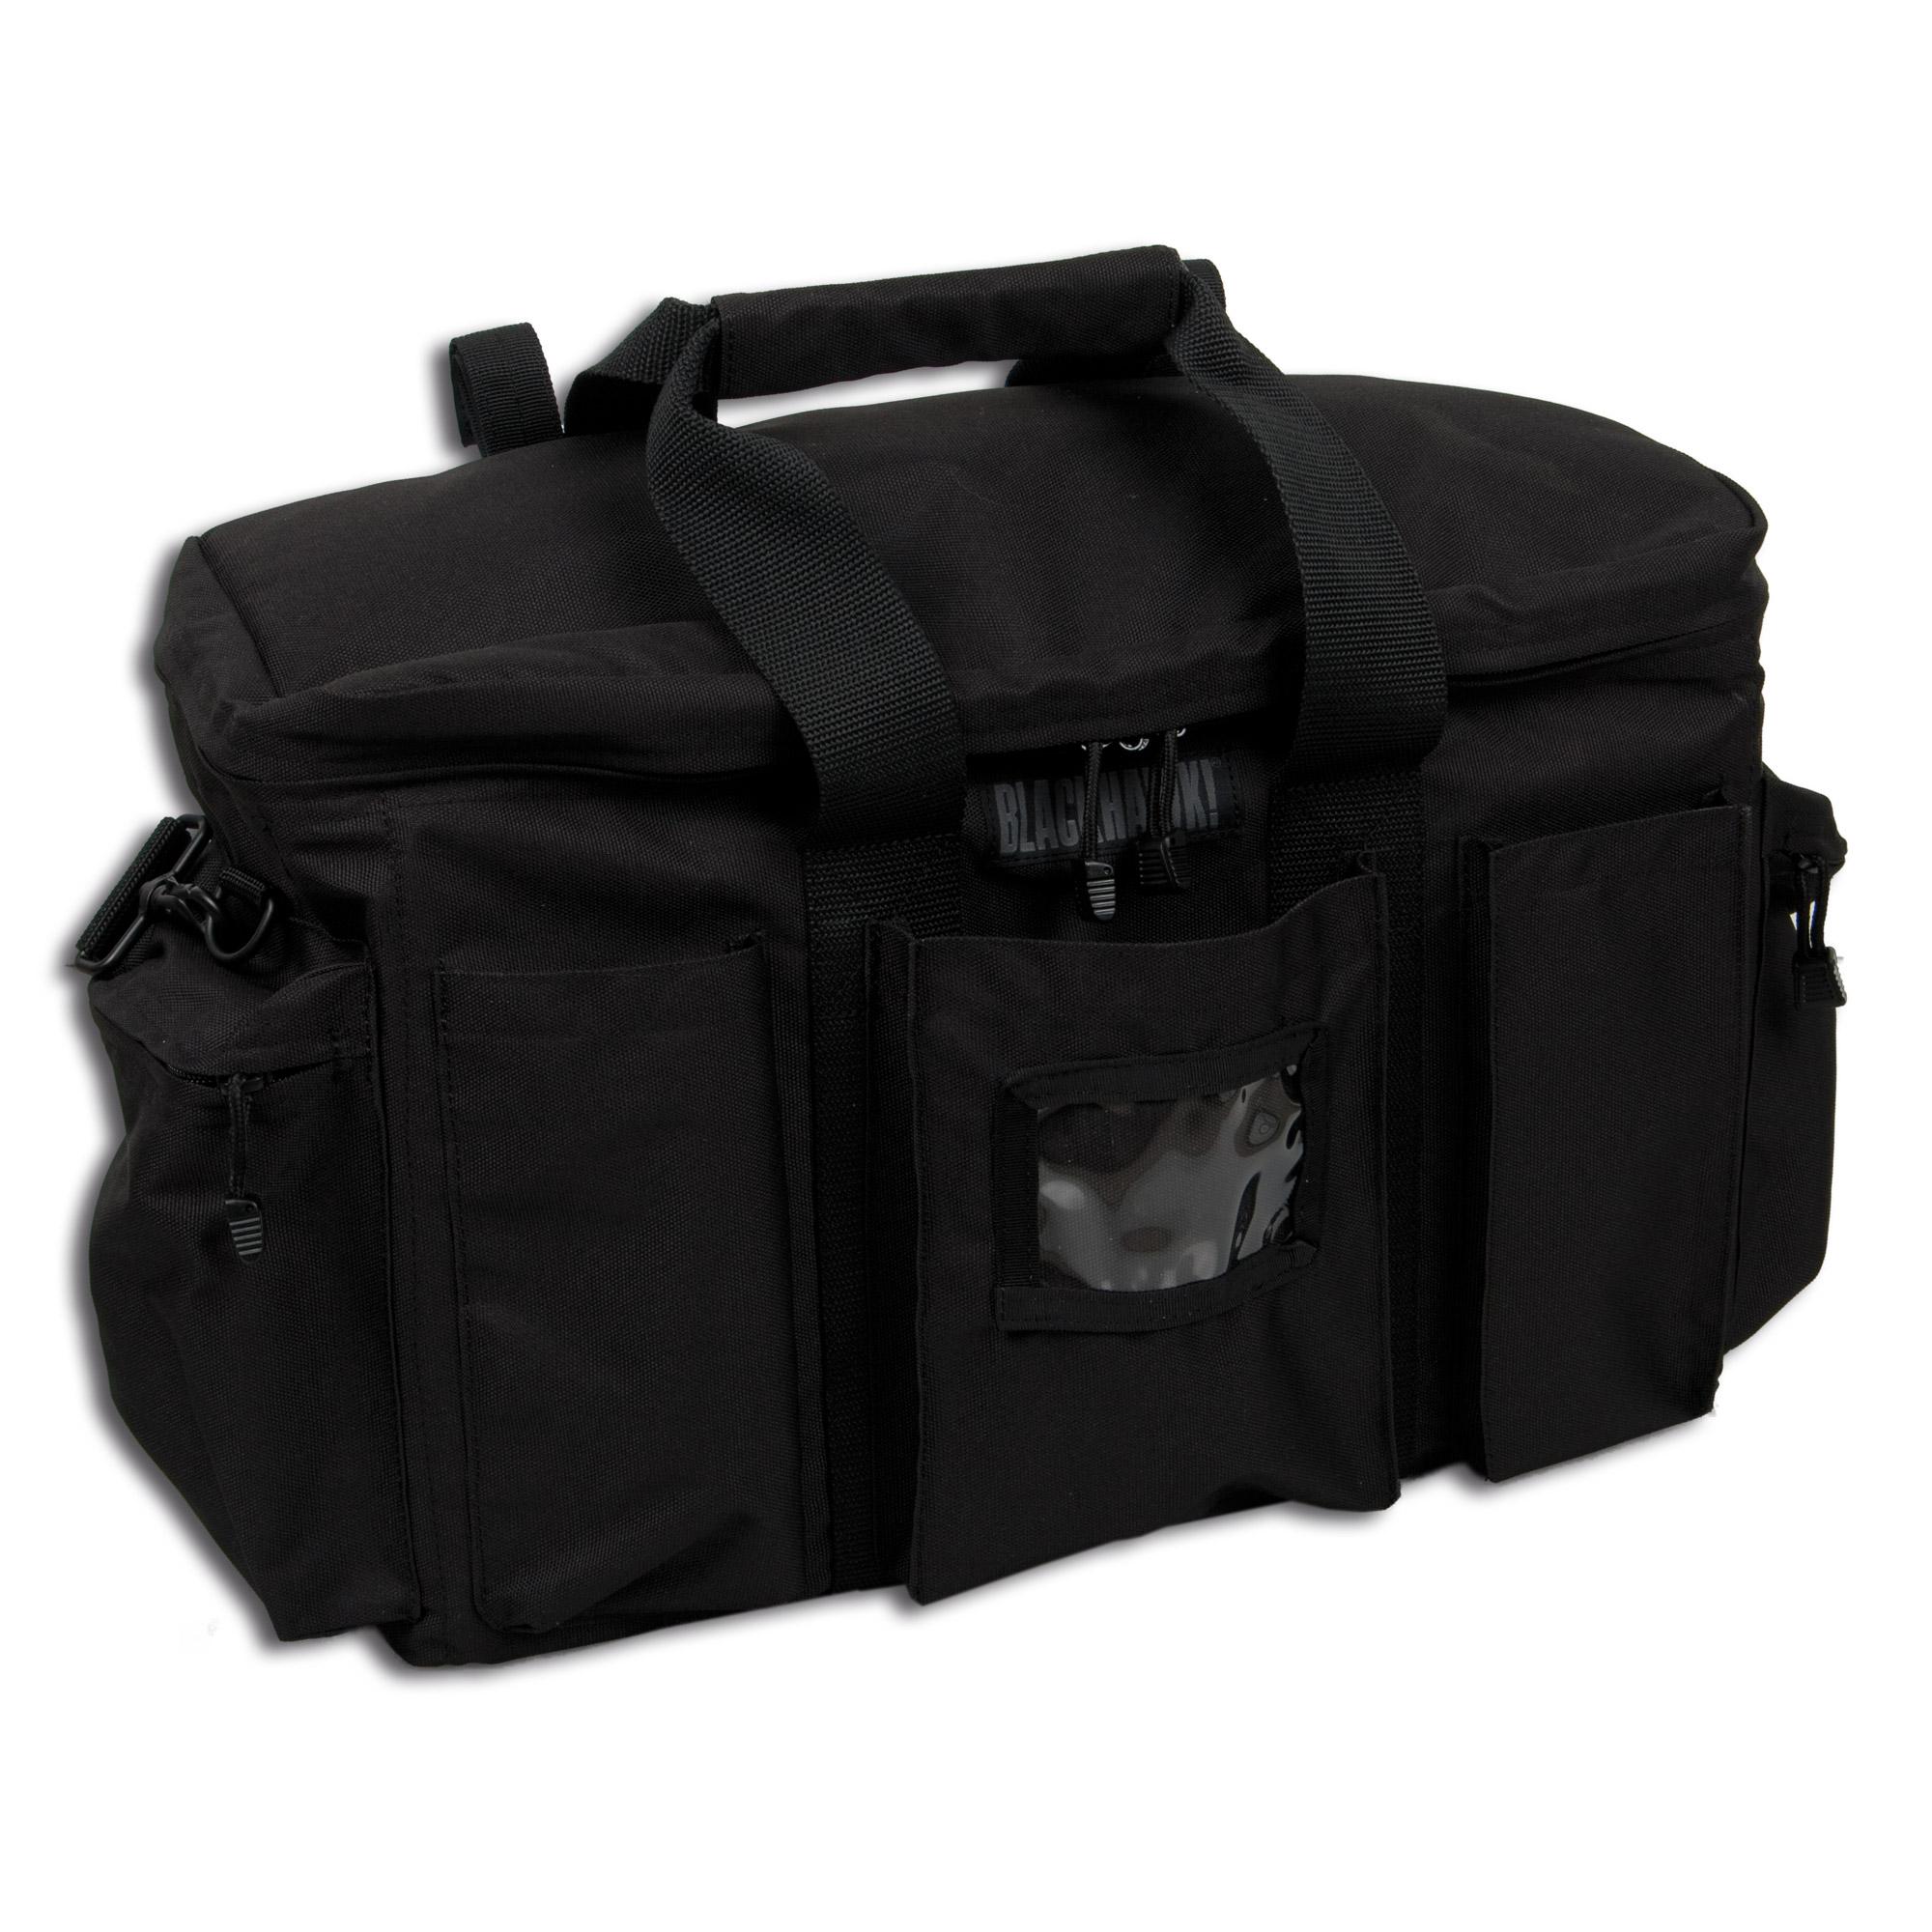 Blackhawk Police Equipment Bag